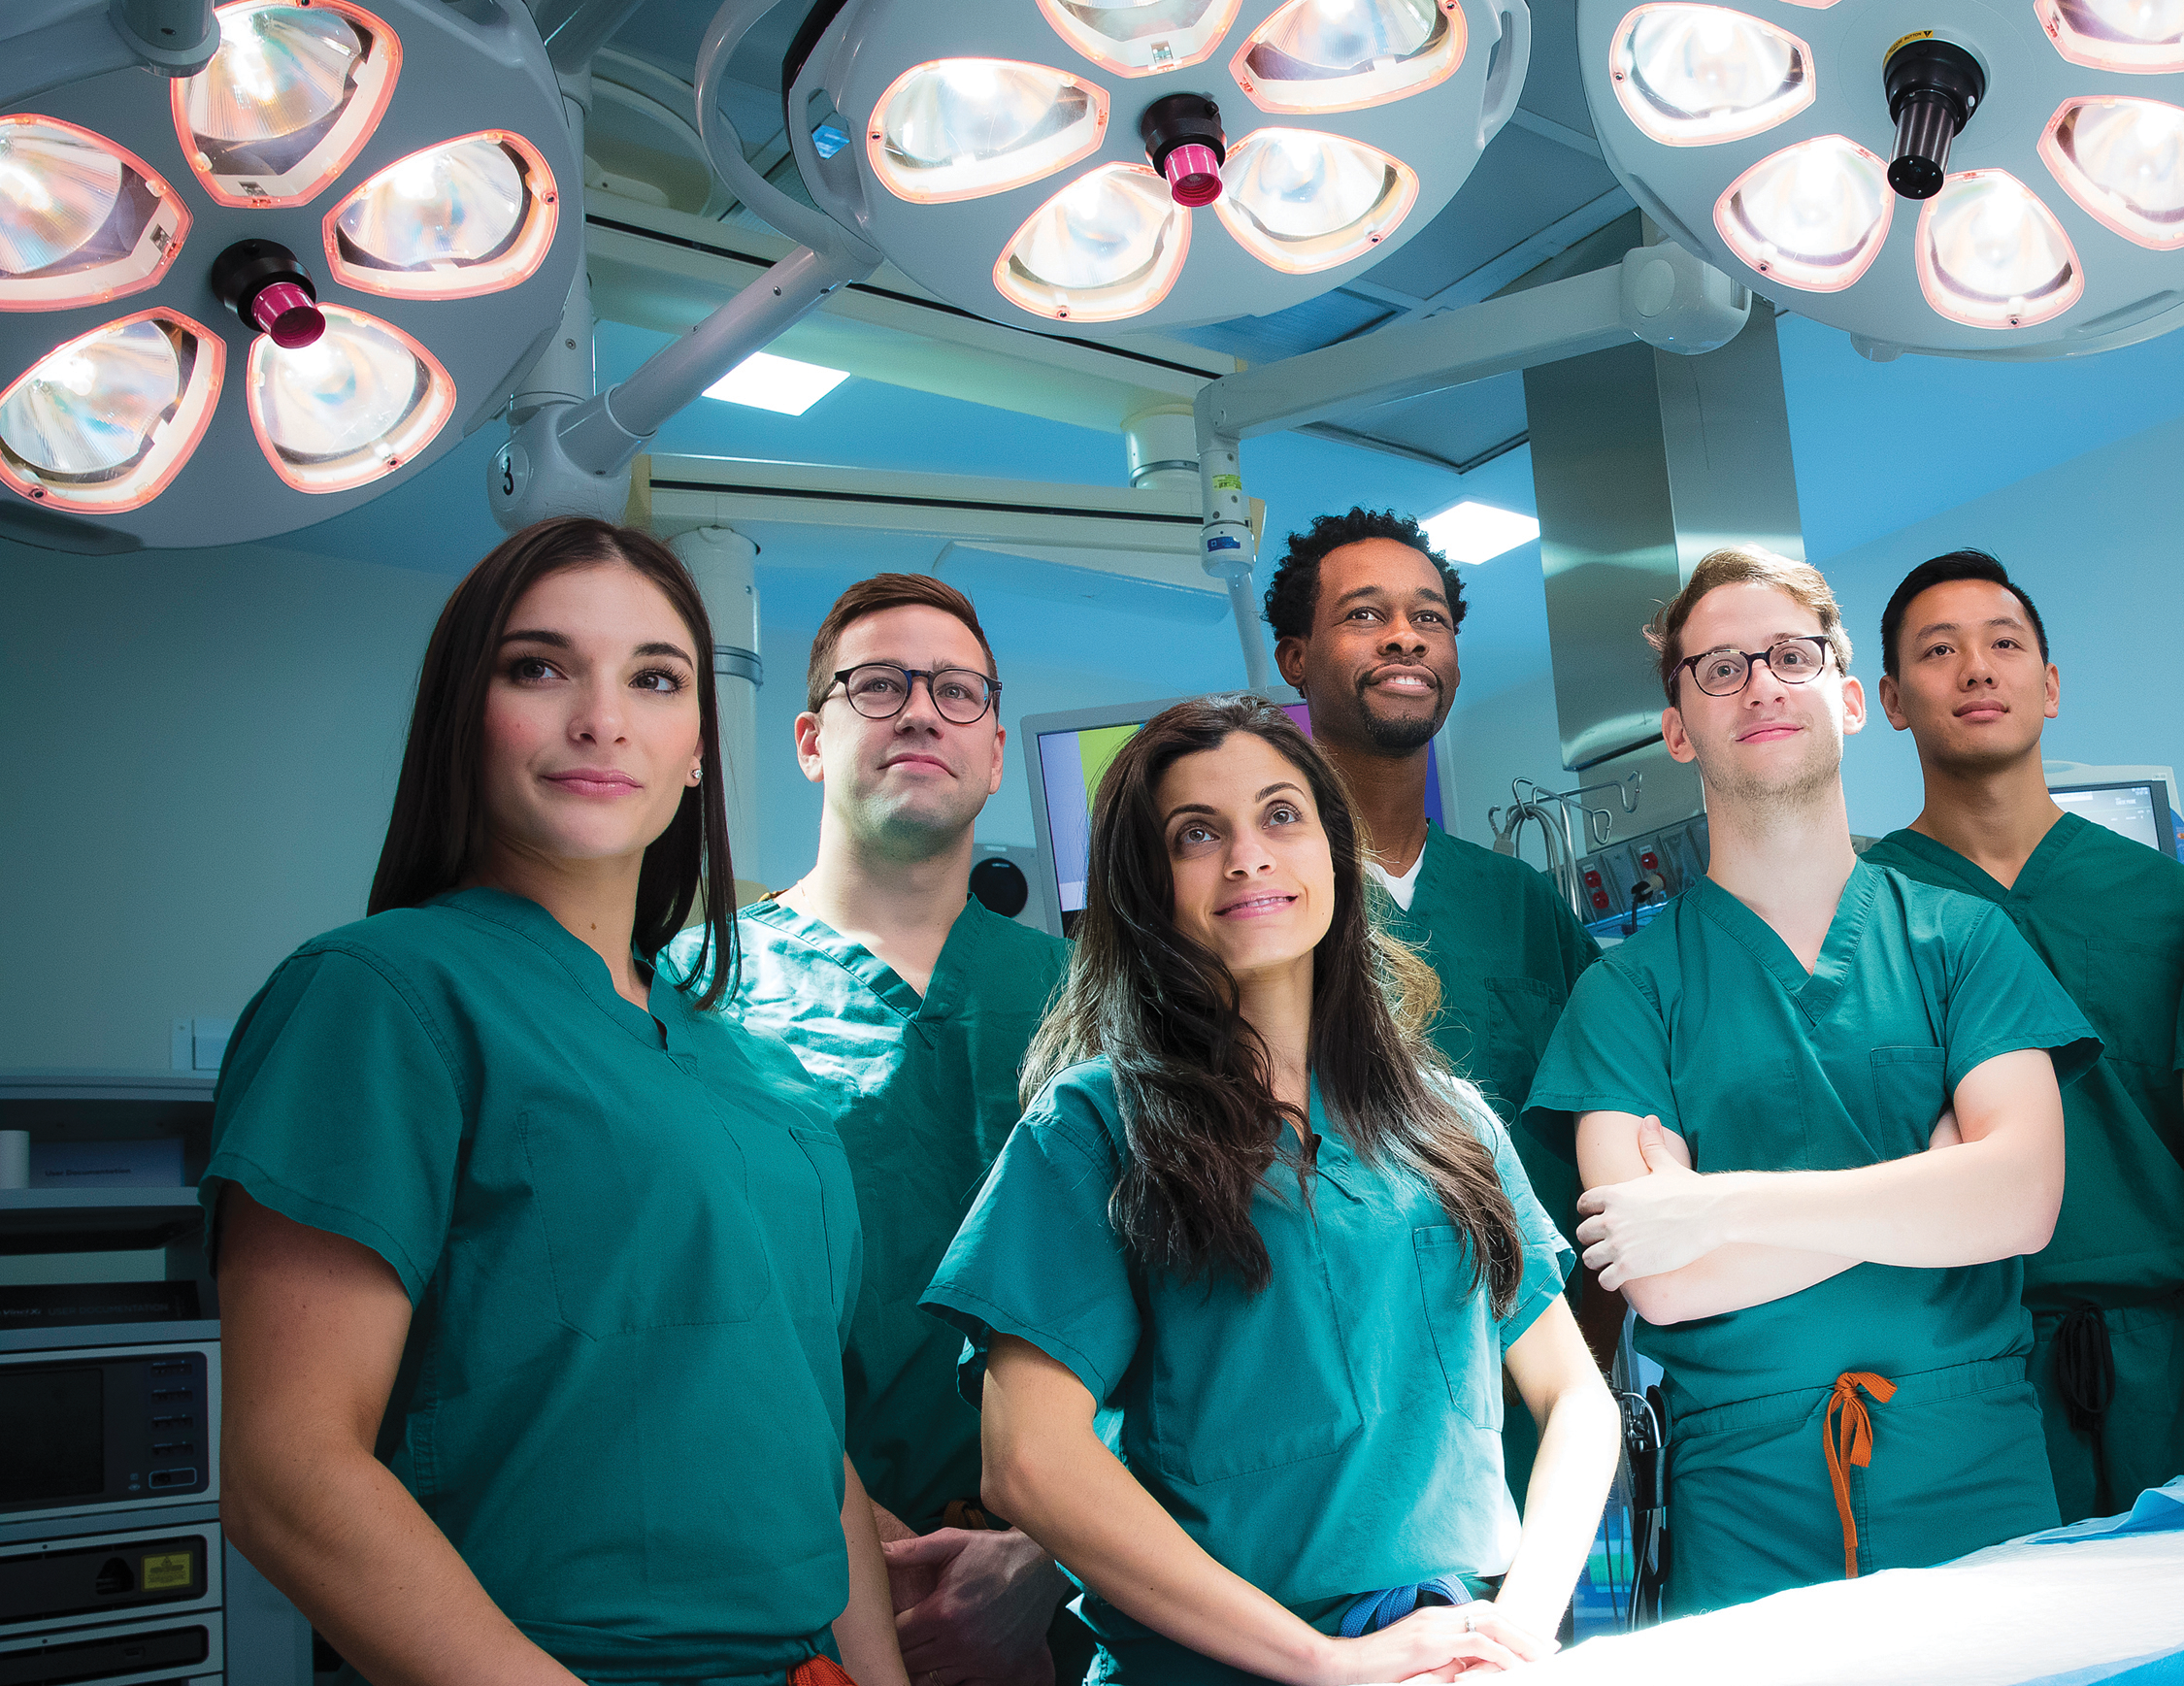 Anesthesia students Alexa Aitkens, Chase Parrish, Ayah Abdallah, Stephen Landell, John Tomasello ('20), Allen Chu, Sonja Schwartzbach, and Bernadette Antunes.